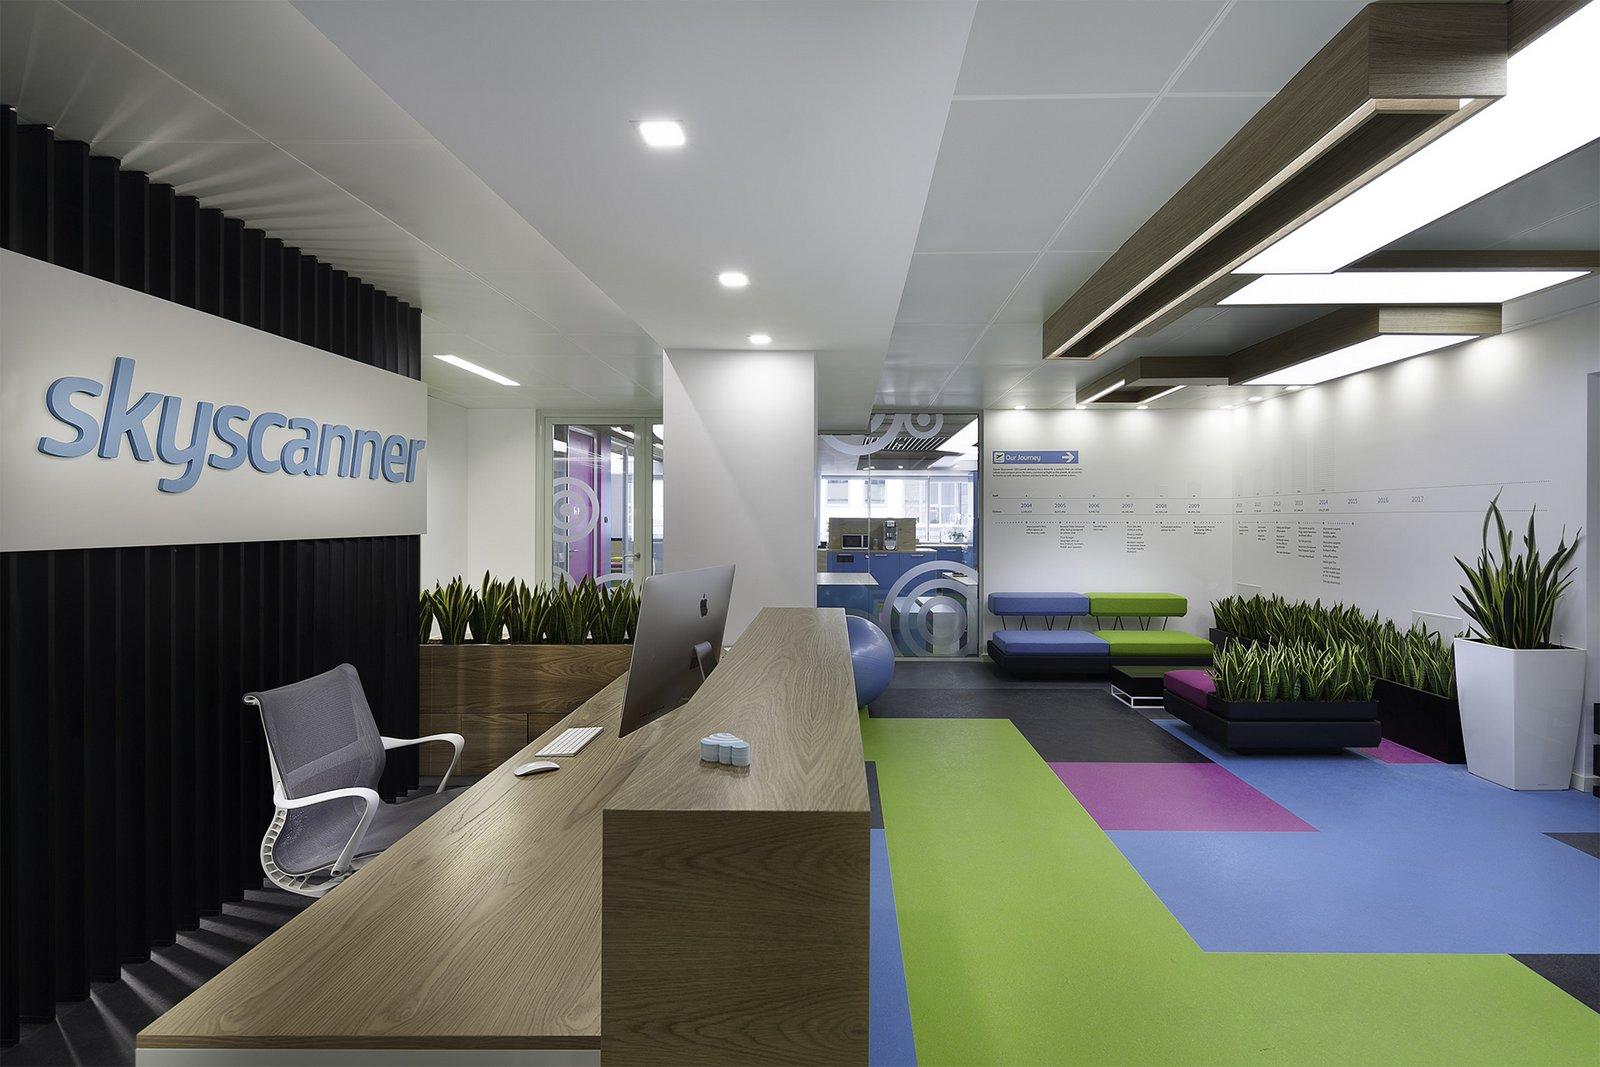 Excellent 23 Office Space Designs Decorating Ideas Design Trends Largest Home Design Picture Inspirations Pitcheantrous